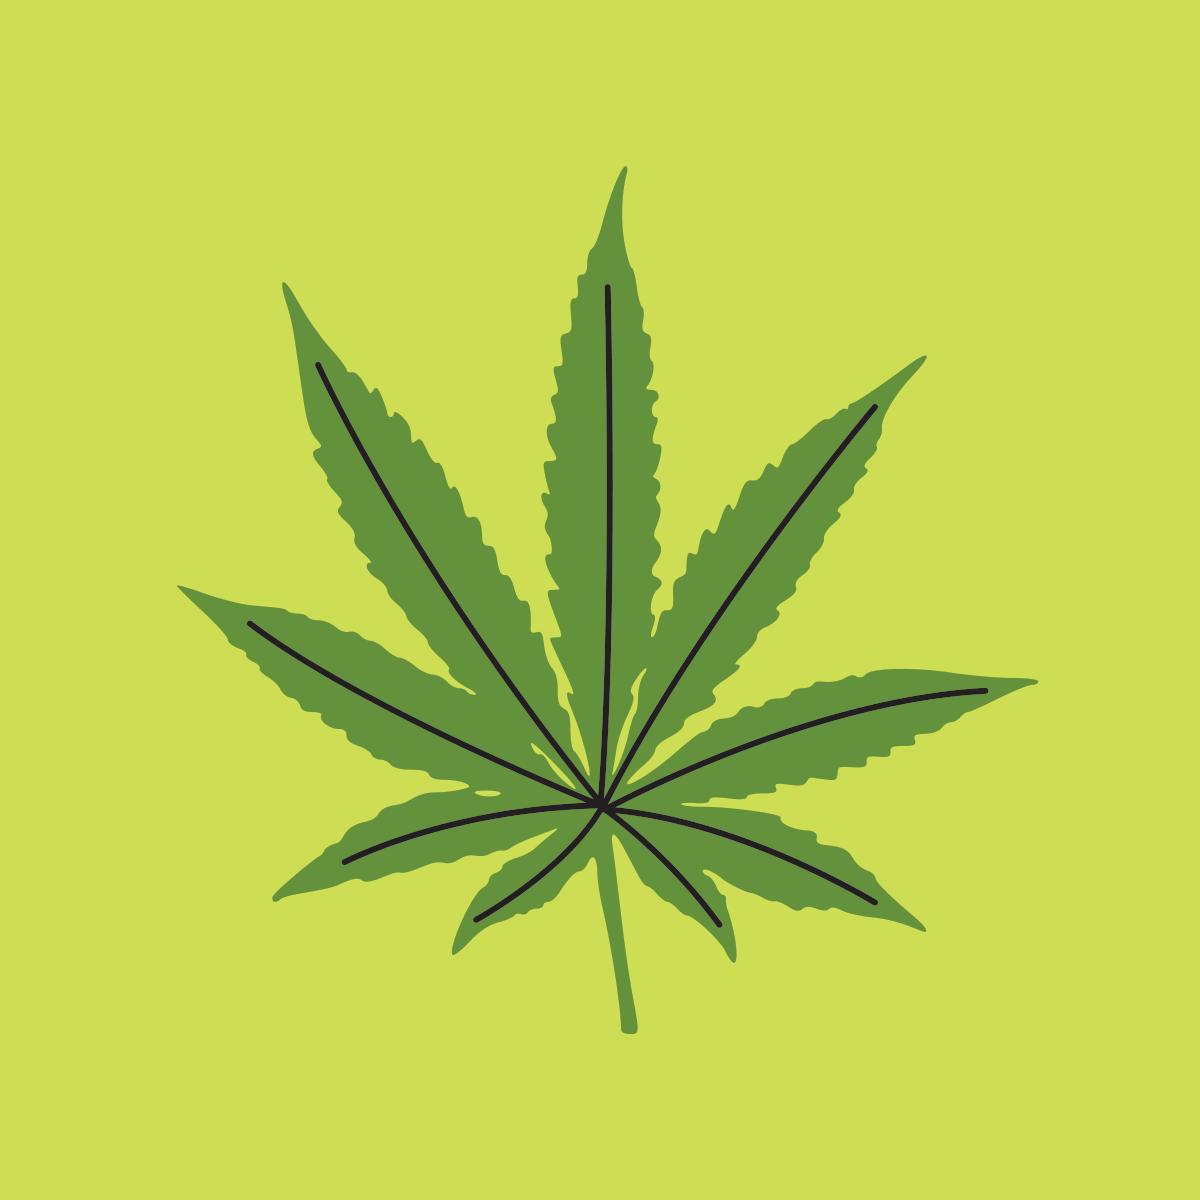 73 legalizing marijuana